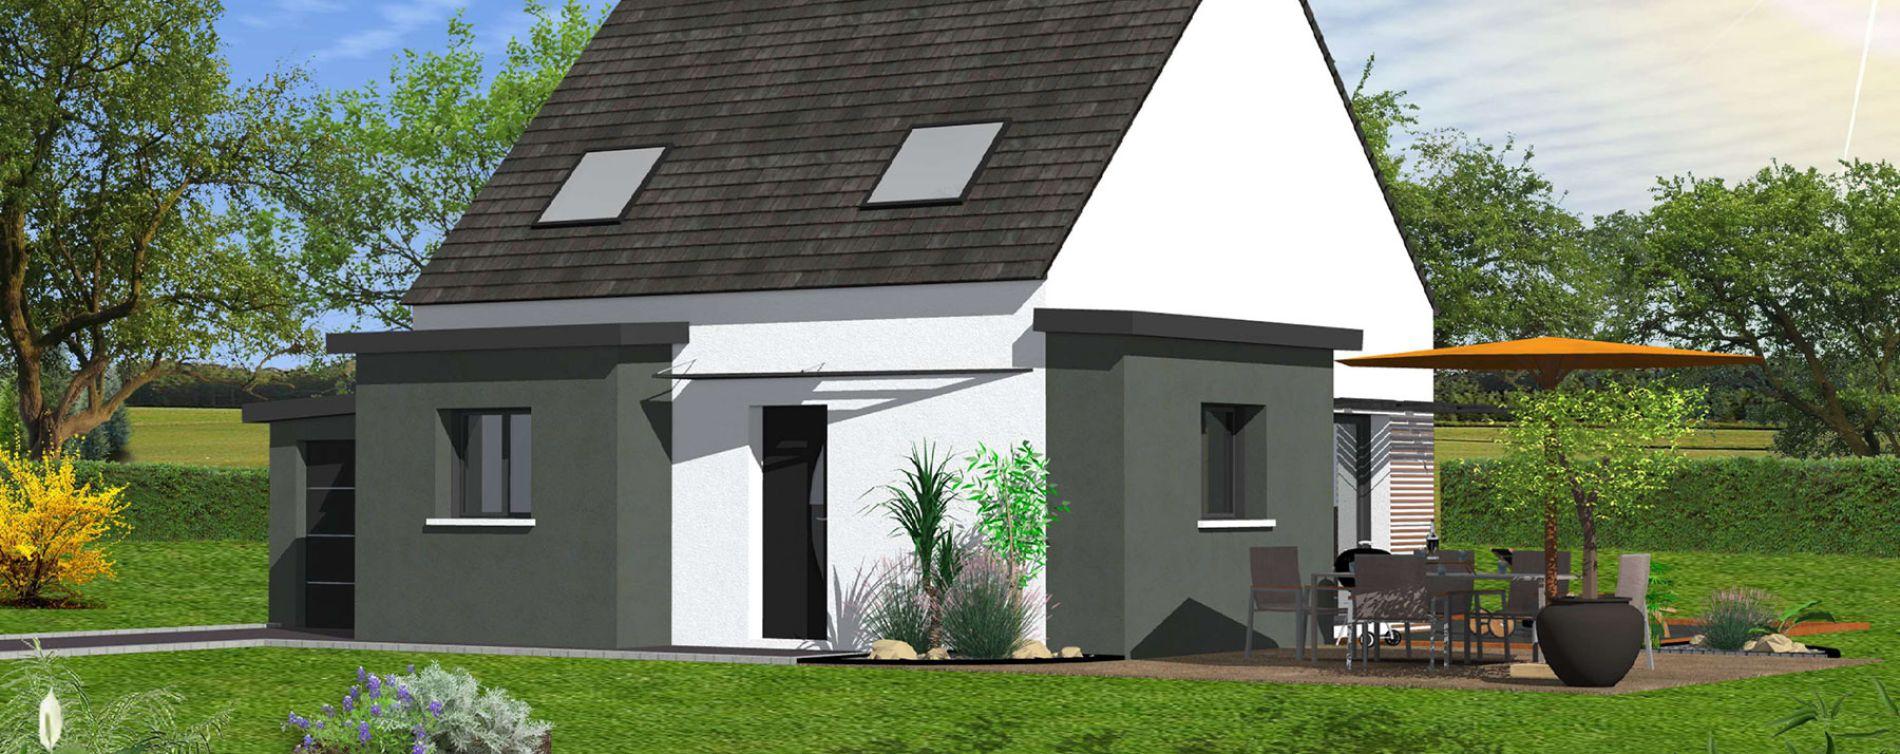 Trémaouézan : programme immobilier neuve « Langazel » (4)